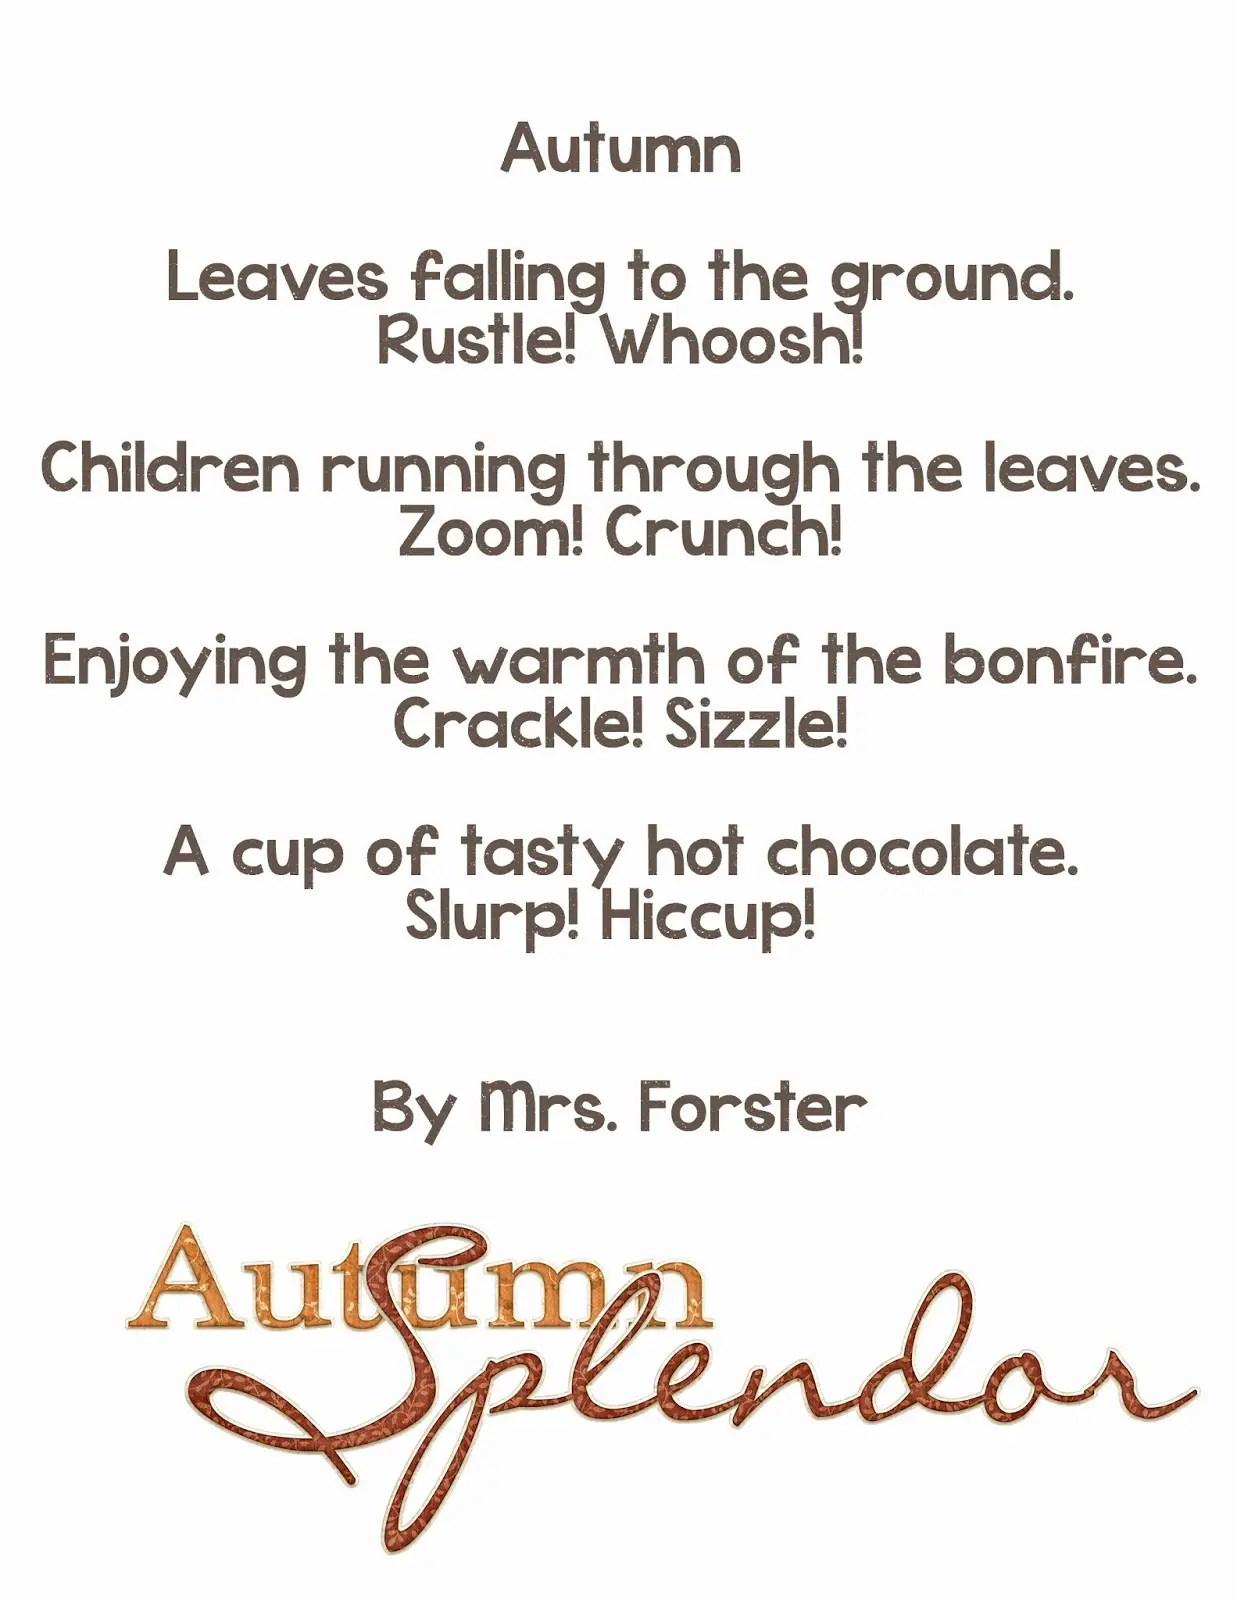 Short Onomatopoeia Poems